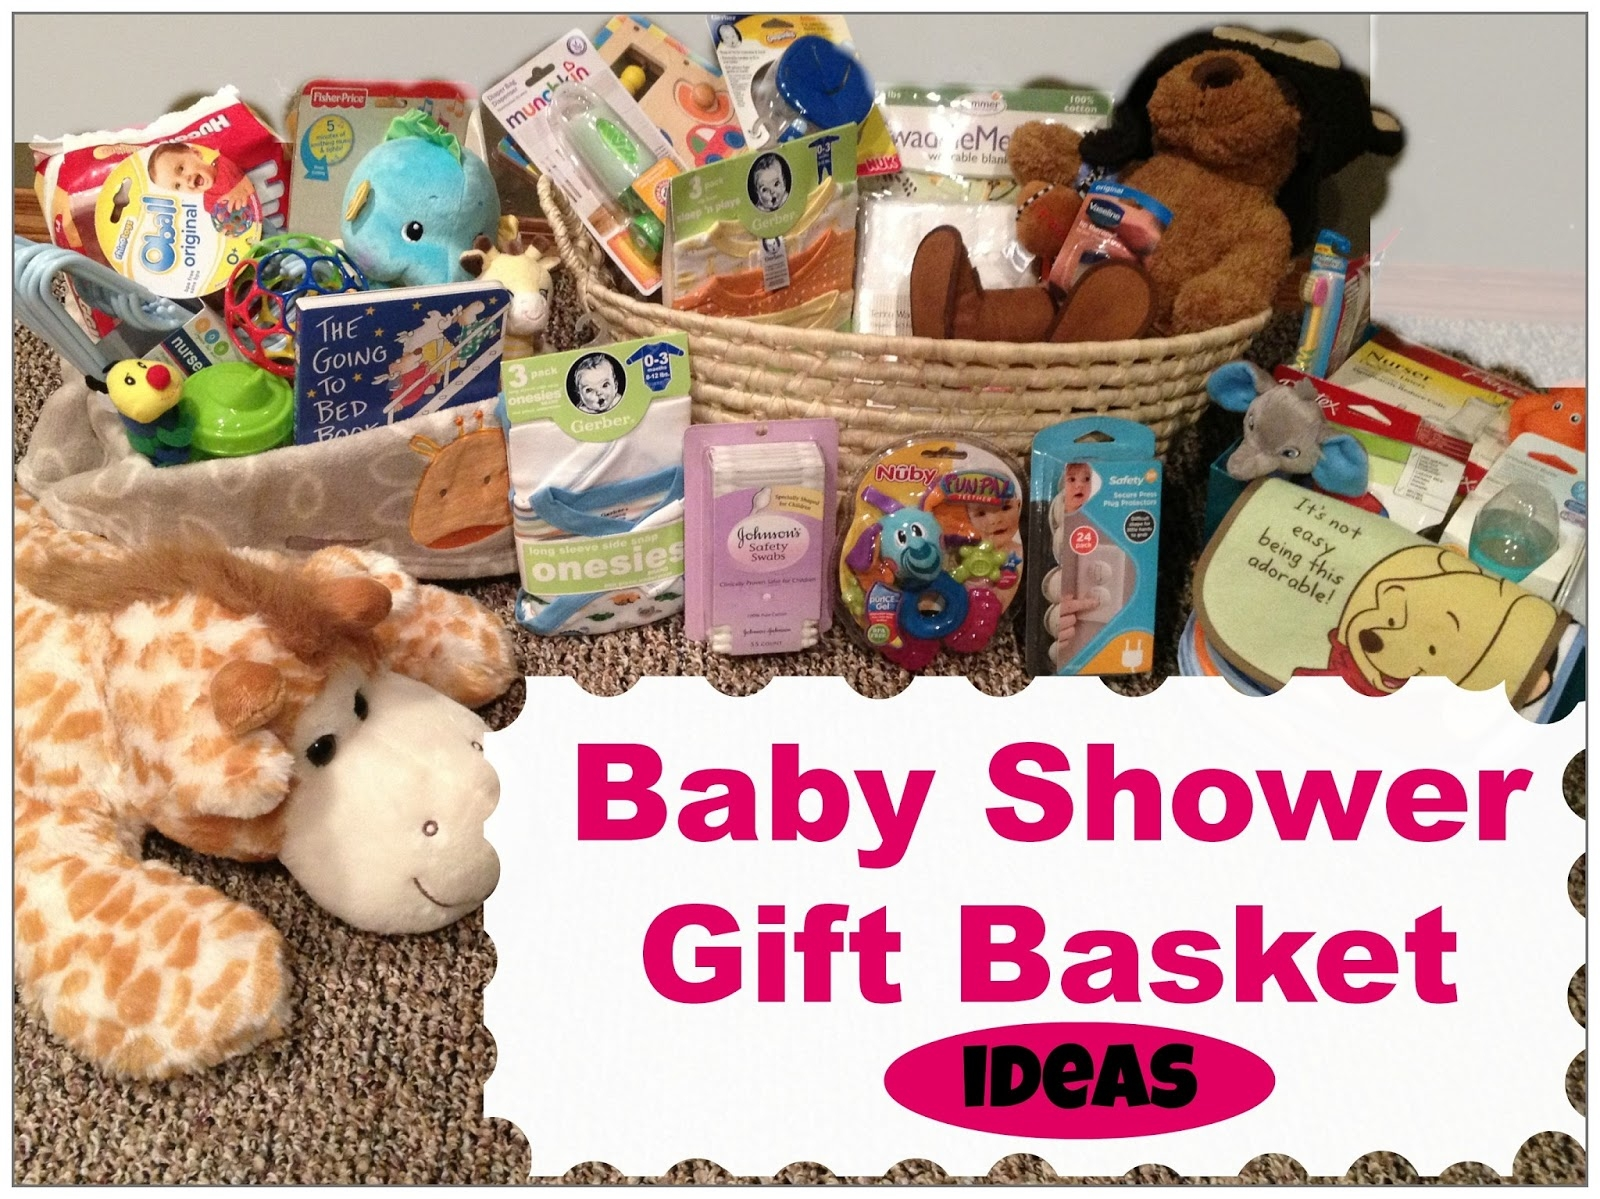 10 Stunning Baby Shower Gift Basket Ideas mommy mia monologues baby shower gift basket ideas